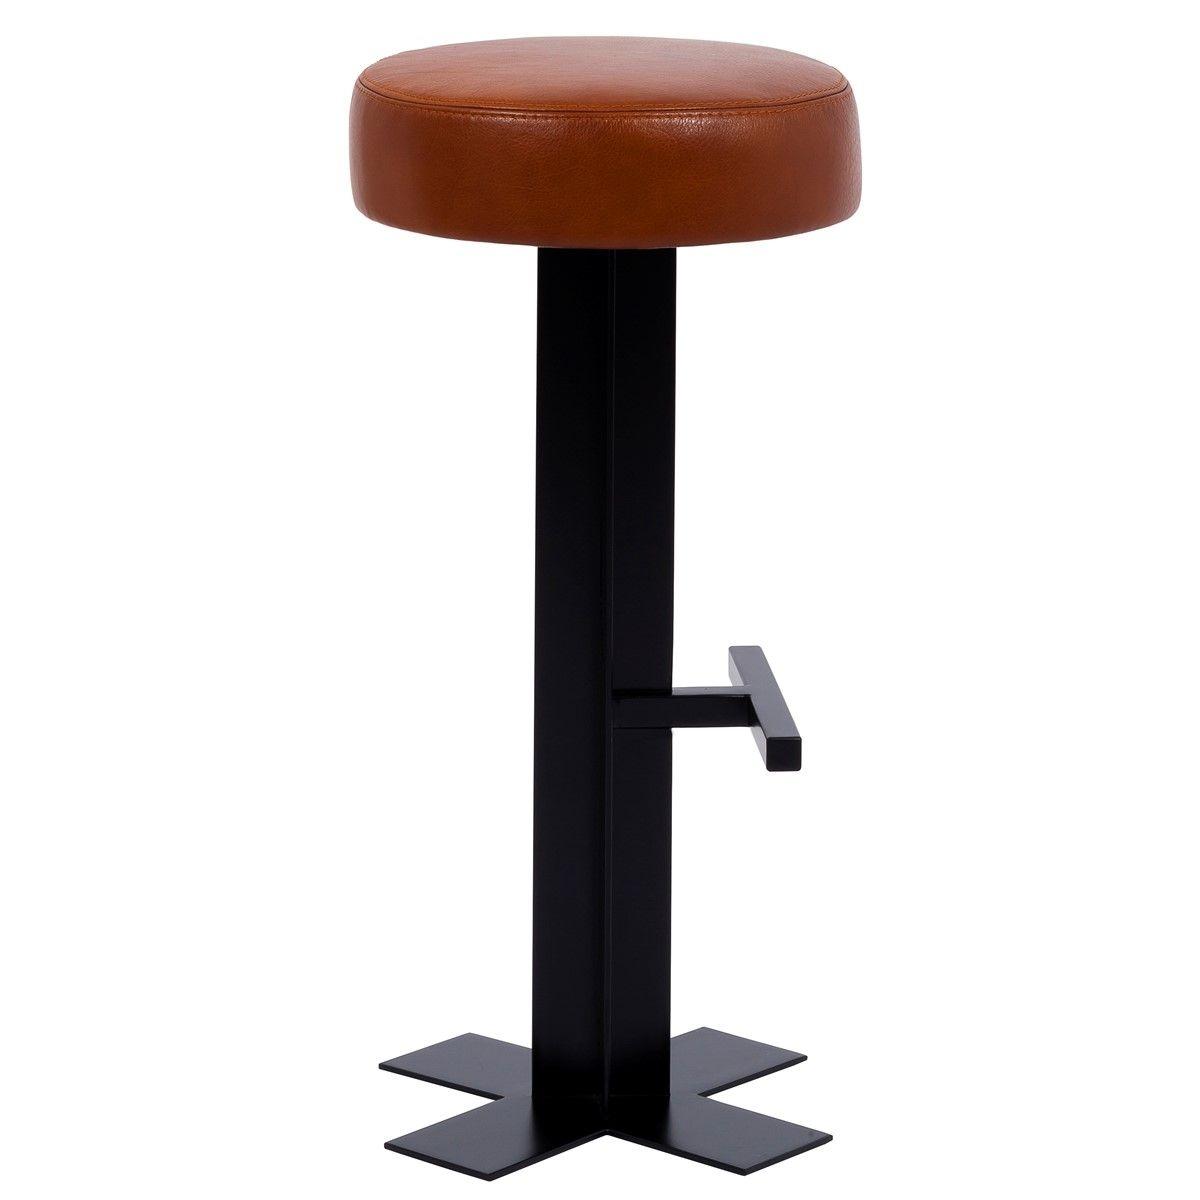 Tabouret de Bar design cuir et métal